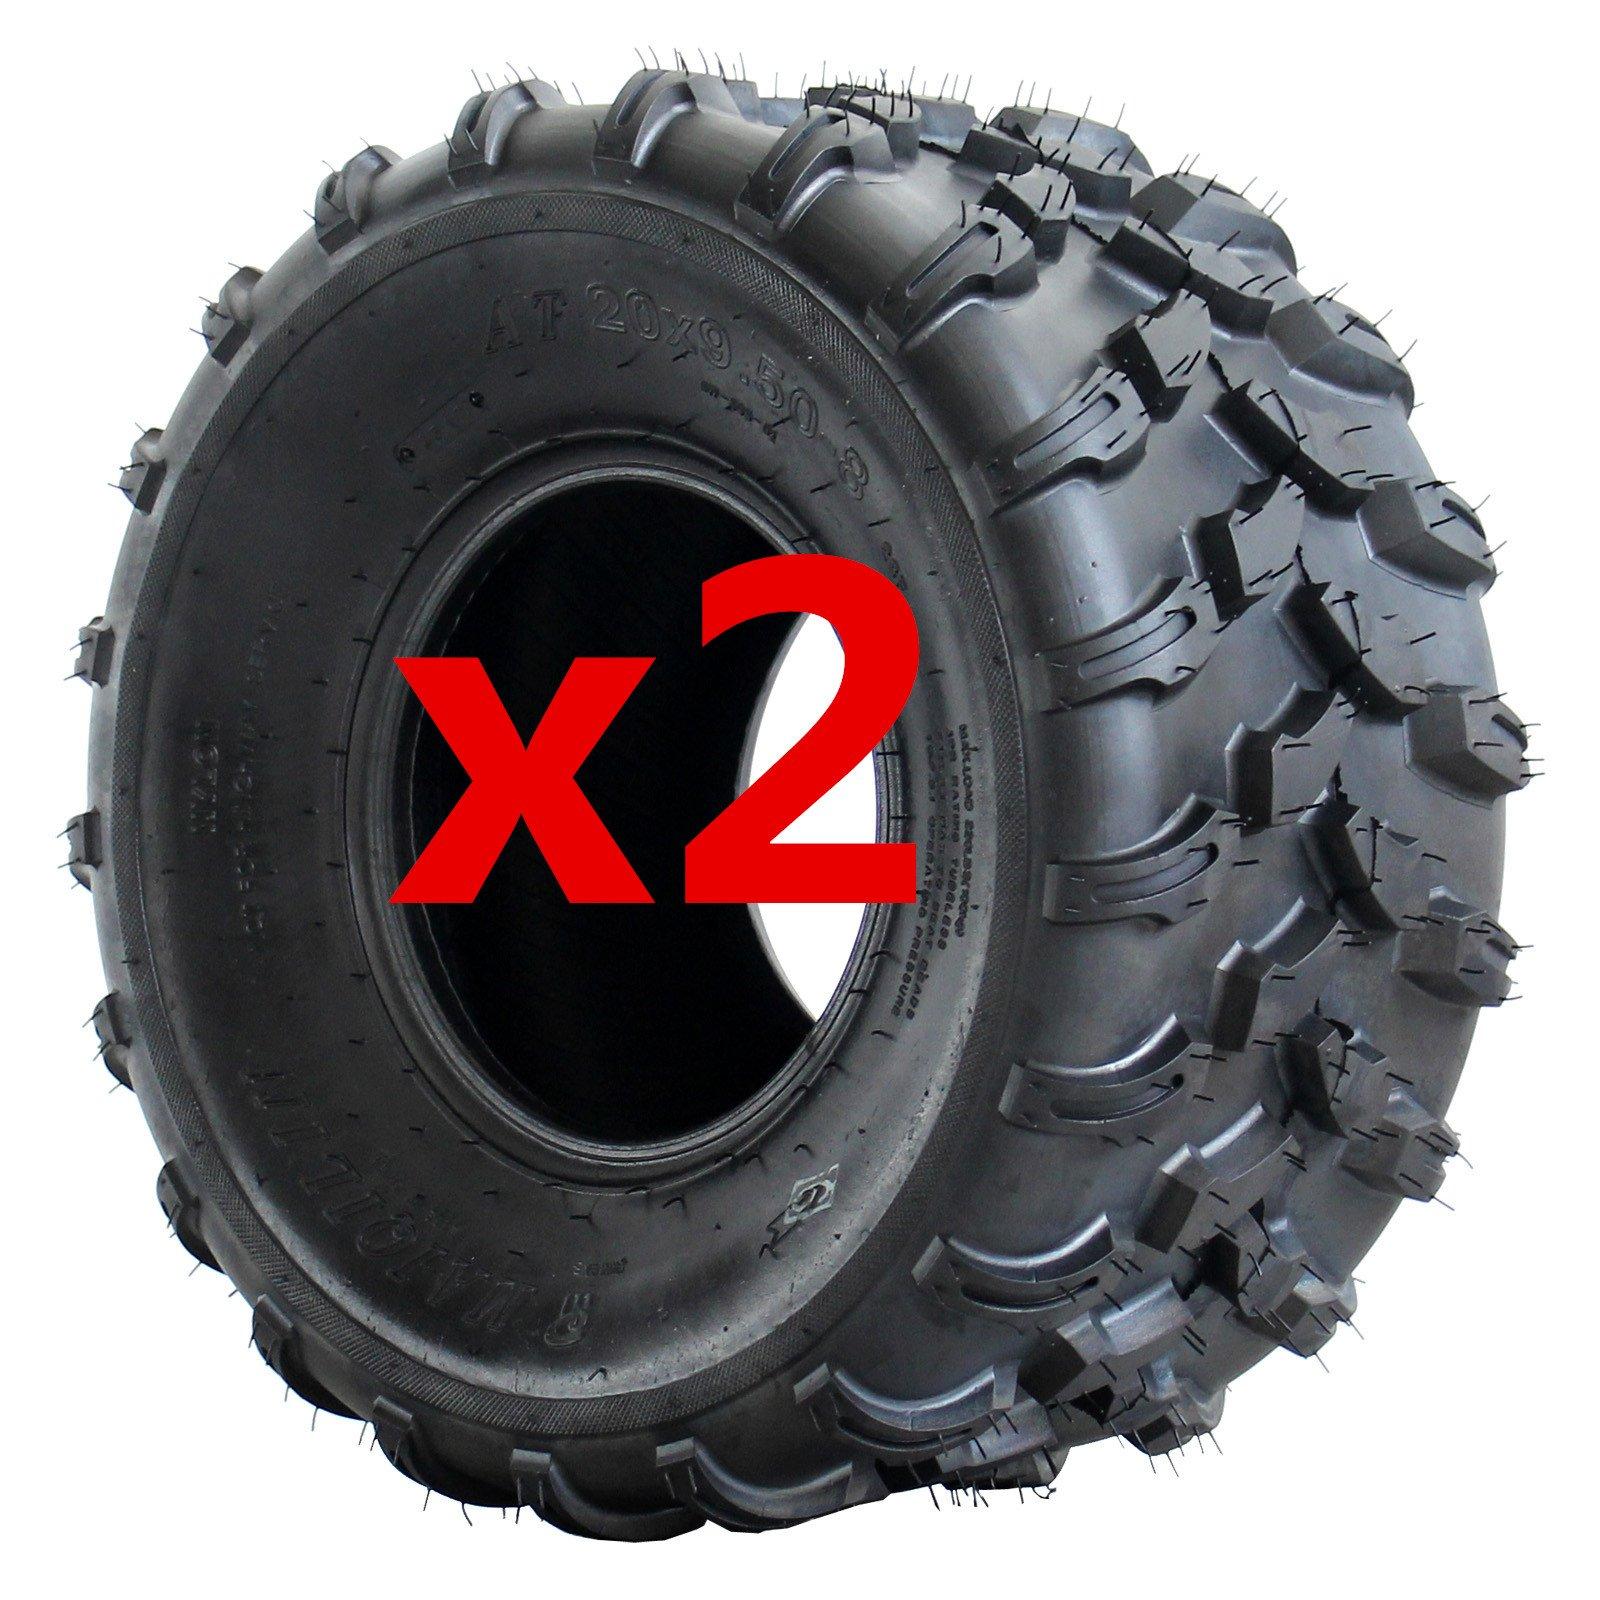 AR DONGFANG 2PCS ATV Tires 18x9.5-8 Quad UTV Go Kart Tires 18x9.5x8 ATV Tire 18x9.50-8 4PR Tubeless